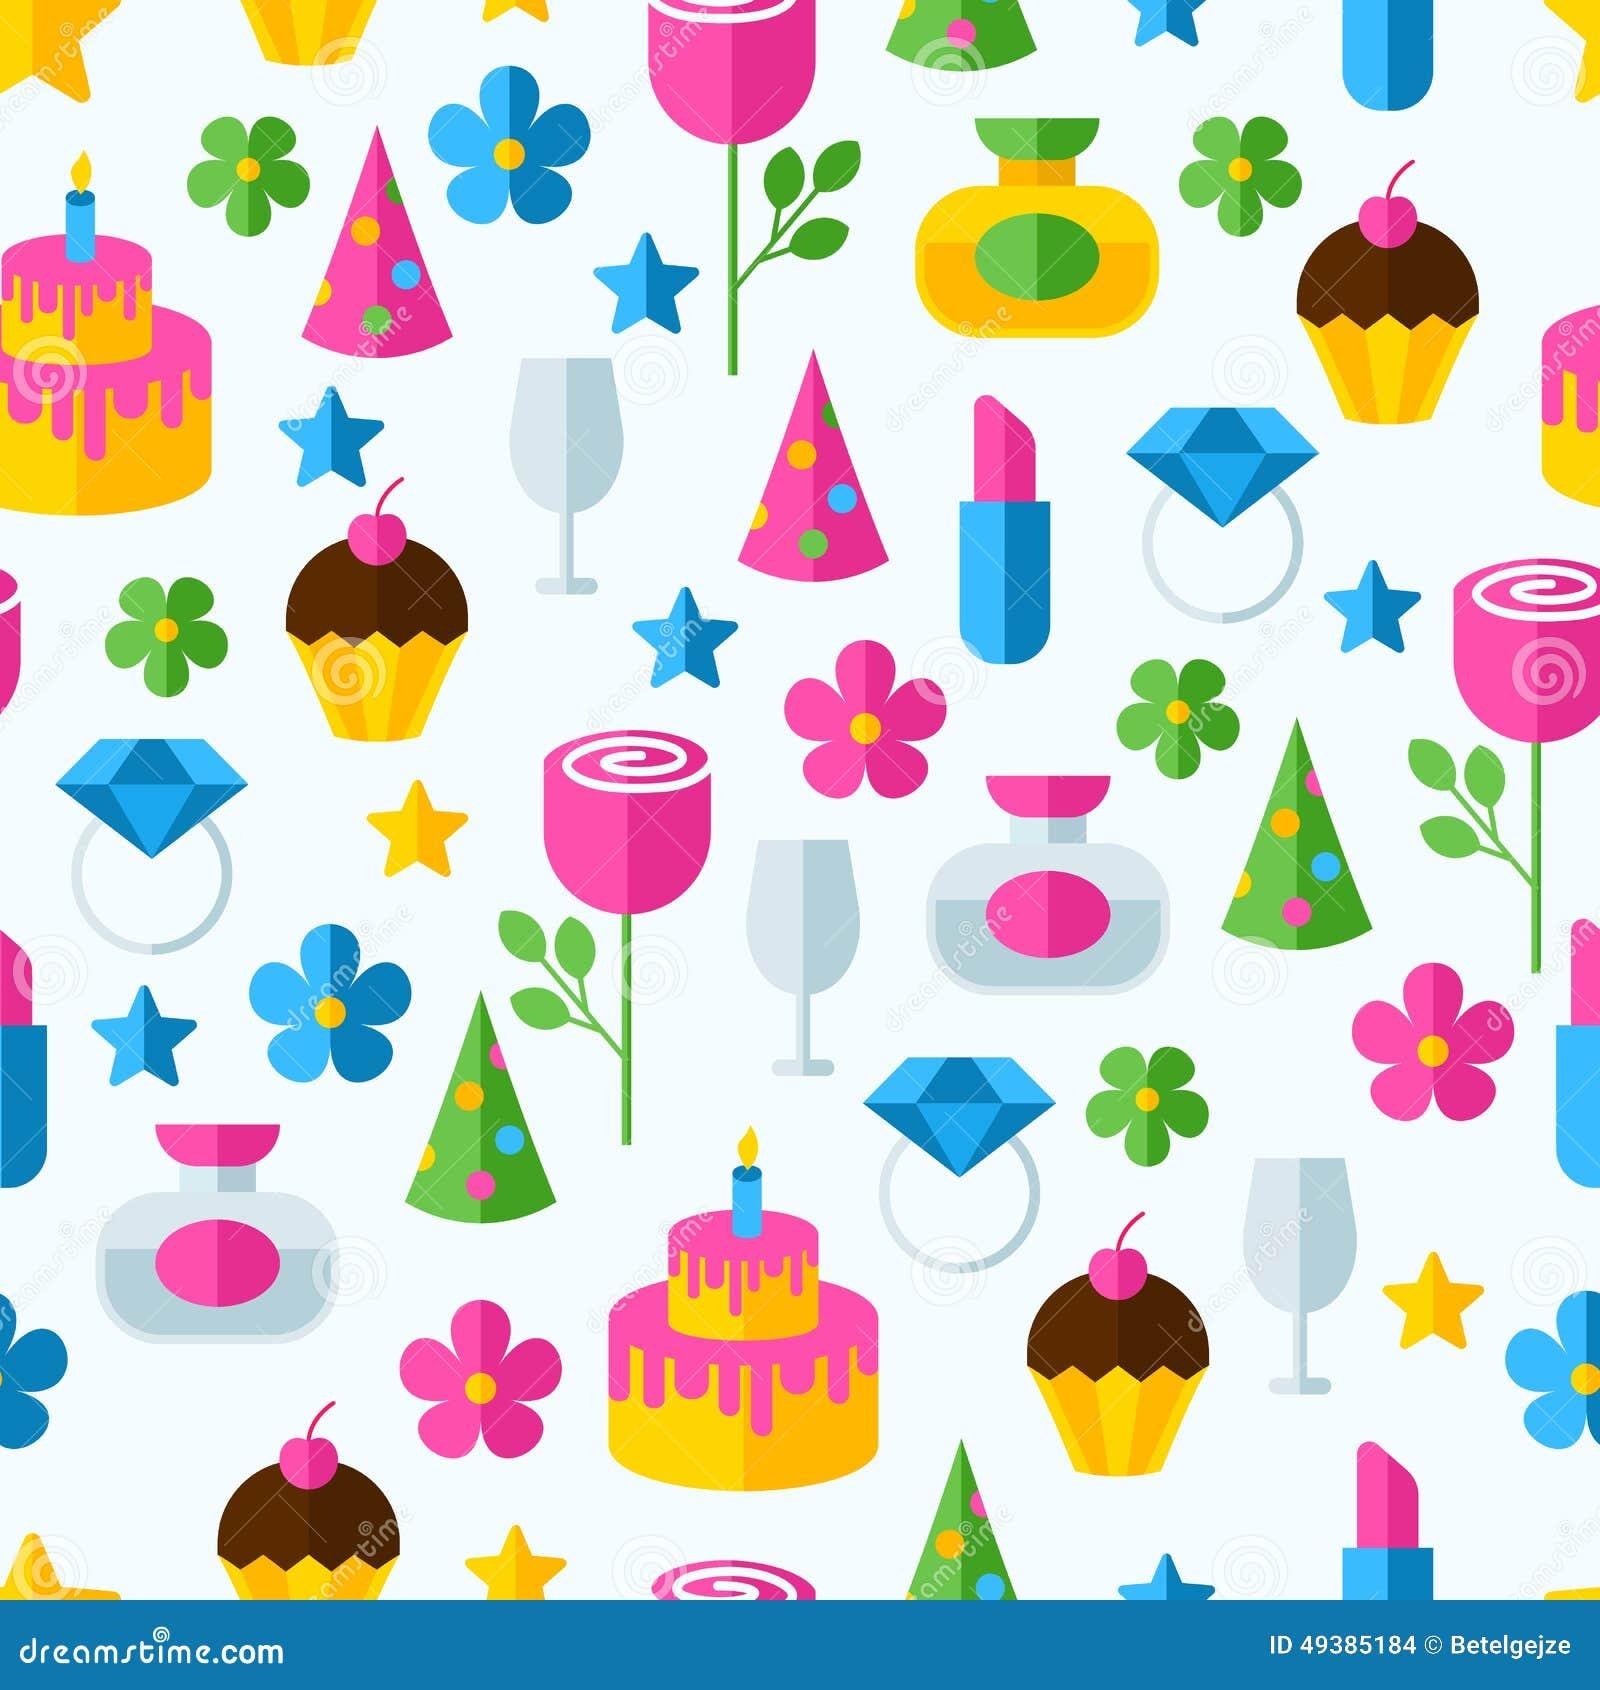 Nahtloses Muster Der Abstrakten Bunten Geschenke Geburtstag